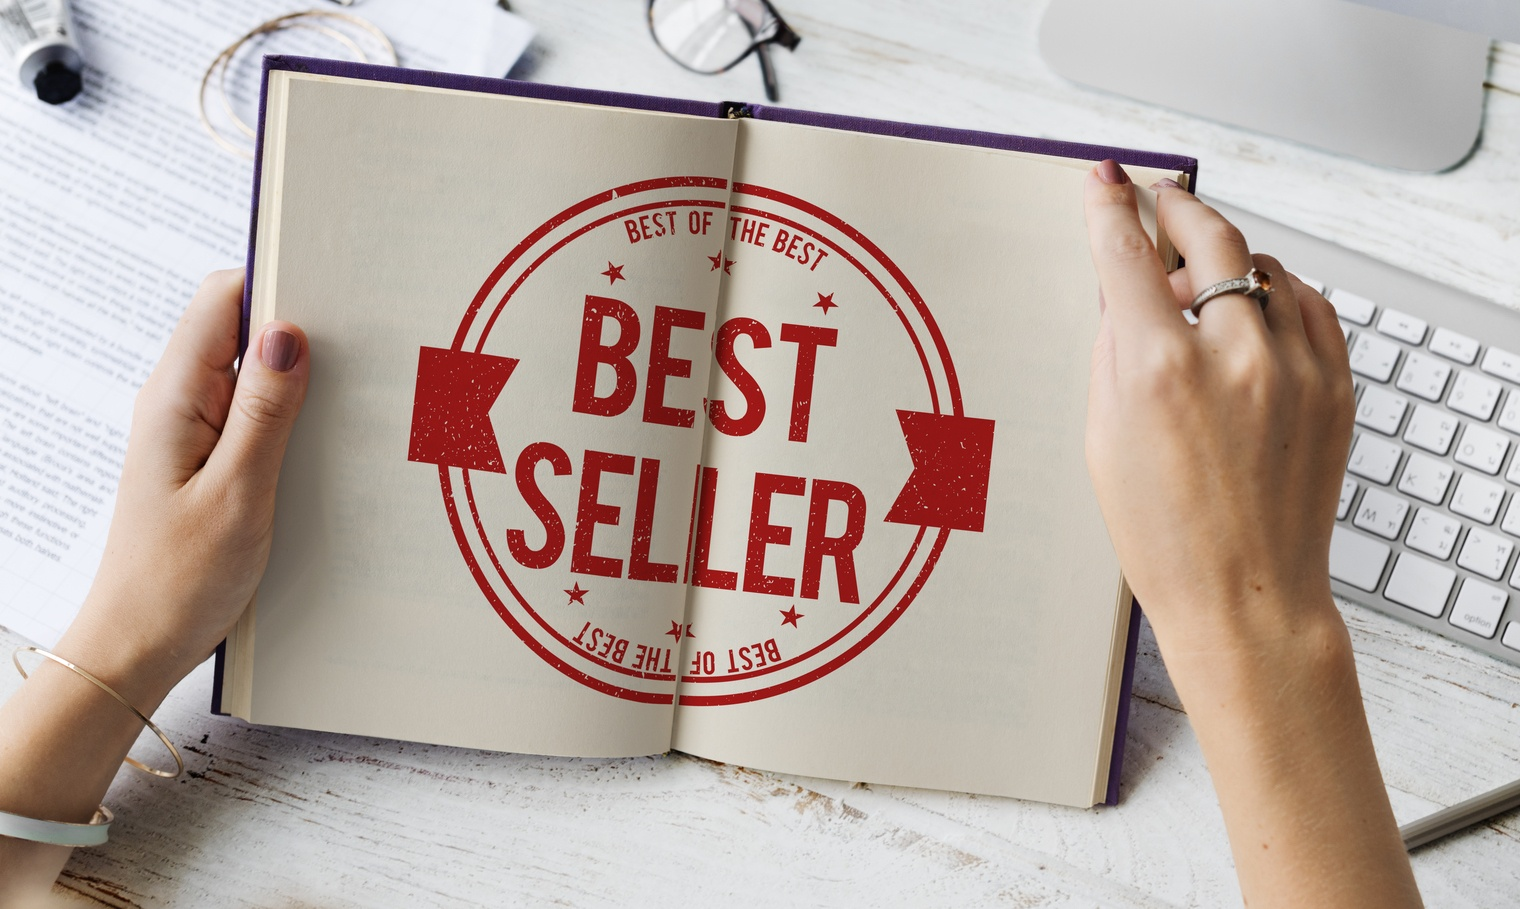 A Writer? 7 Potent Ways to Make Your Book an International Bestseller